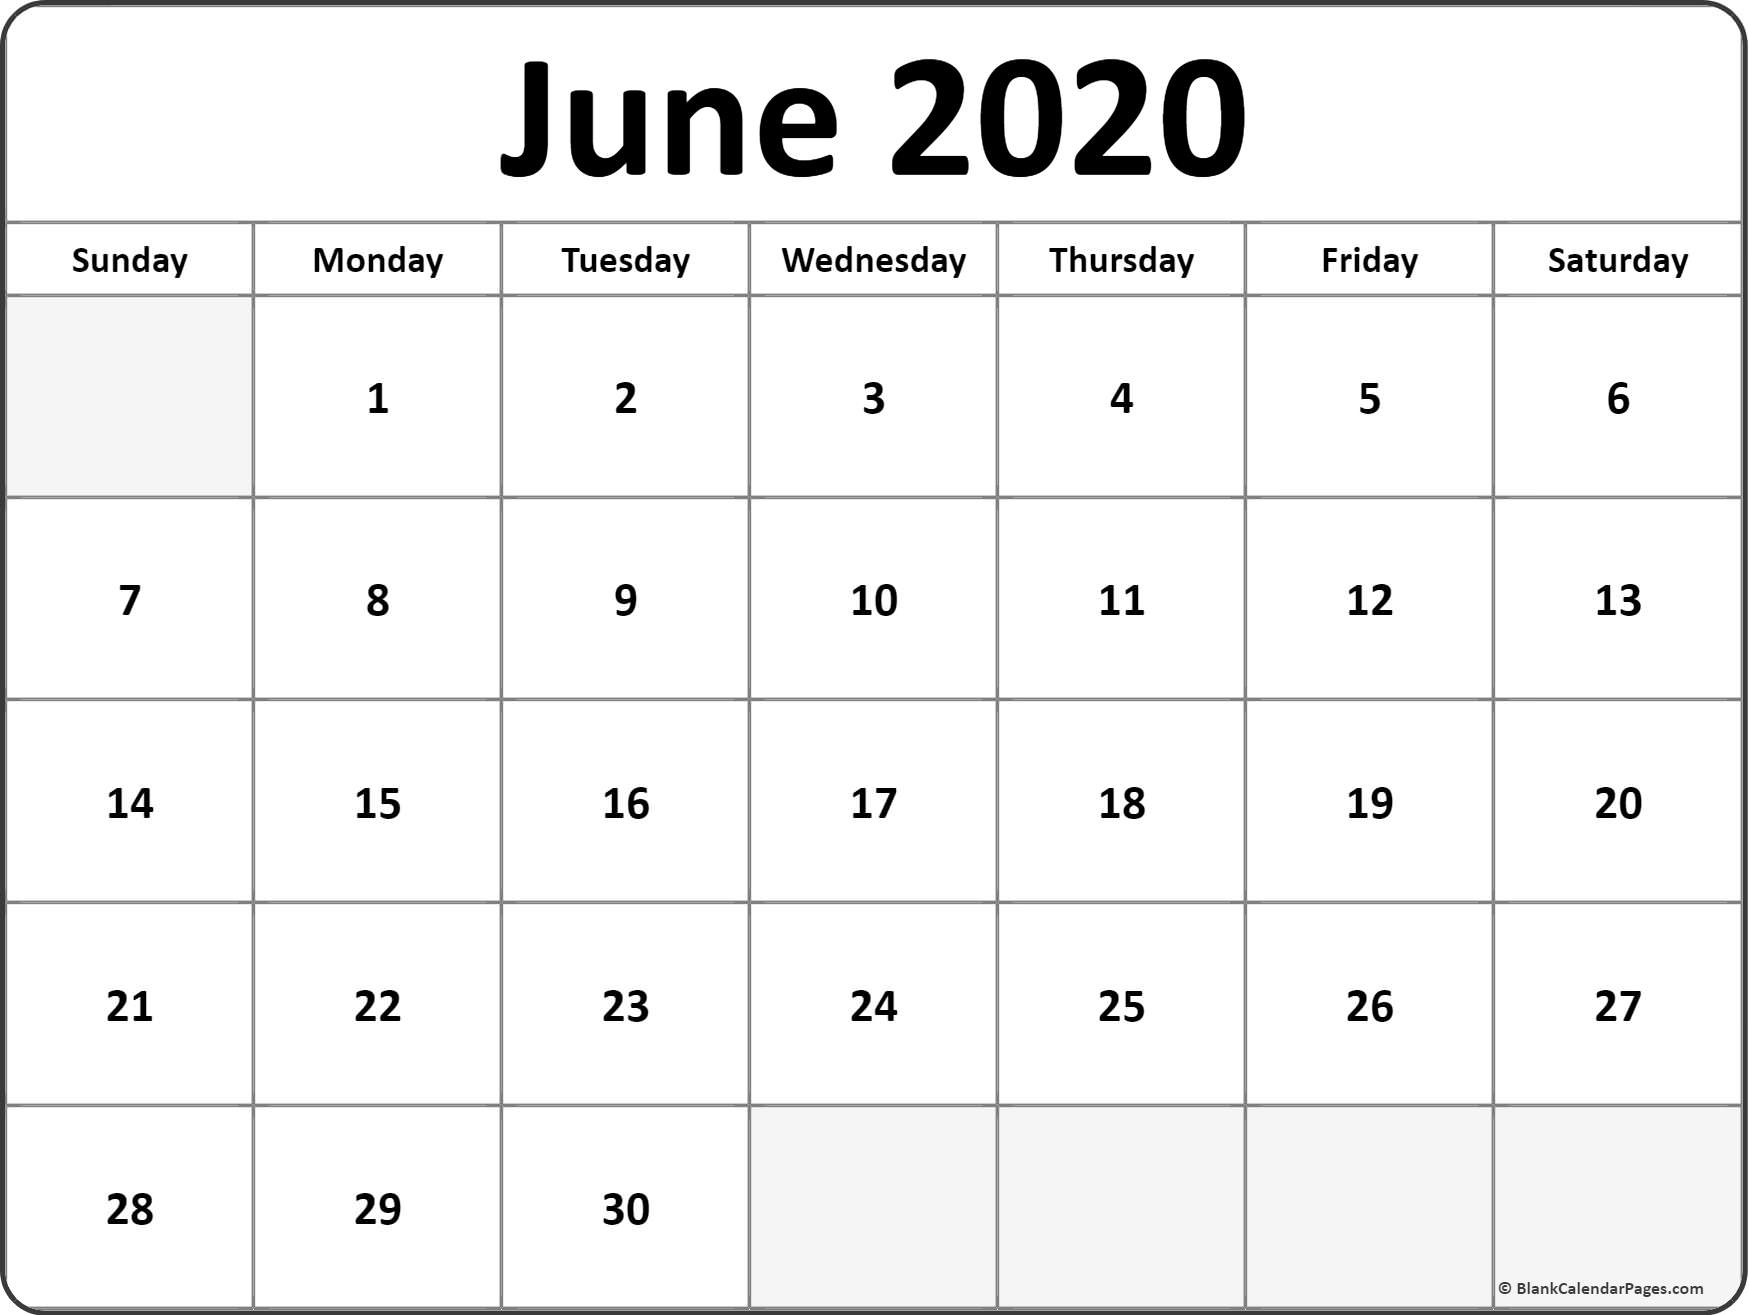 June 2020 Blank Calendar Templates.